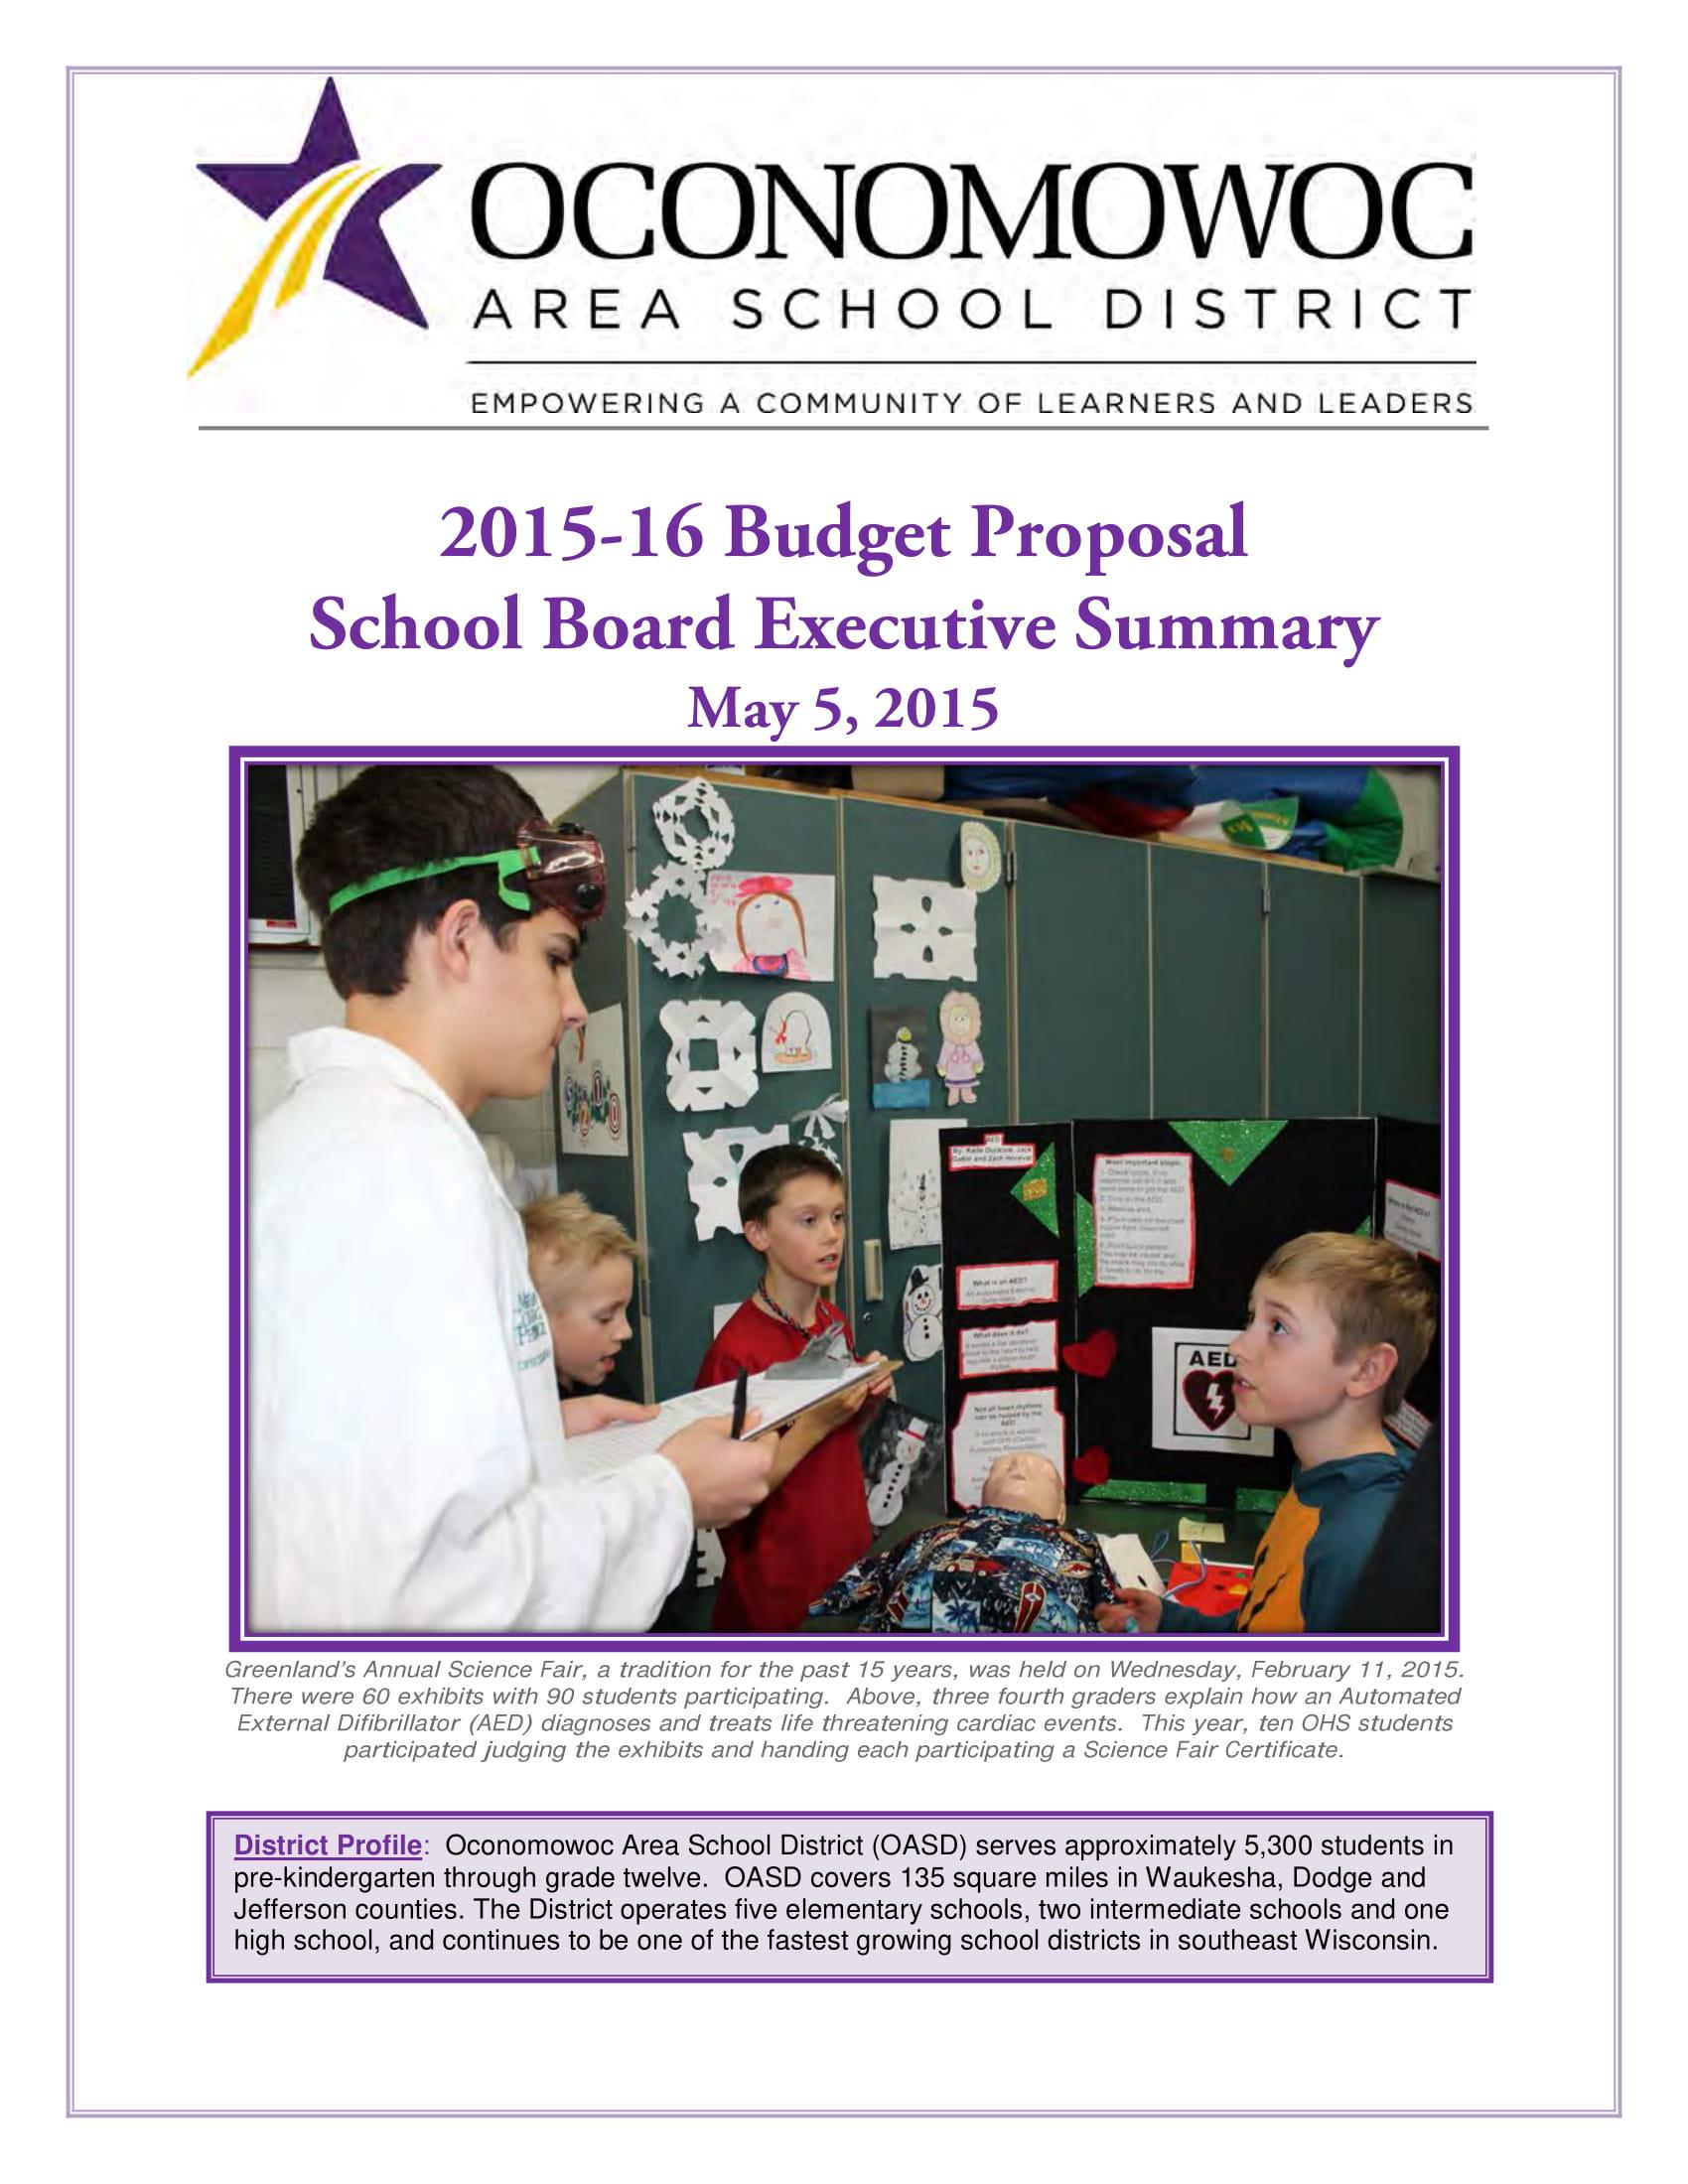 budget proposal school board executive summary example 01